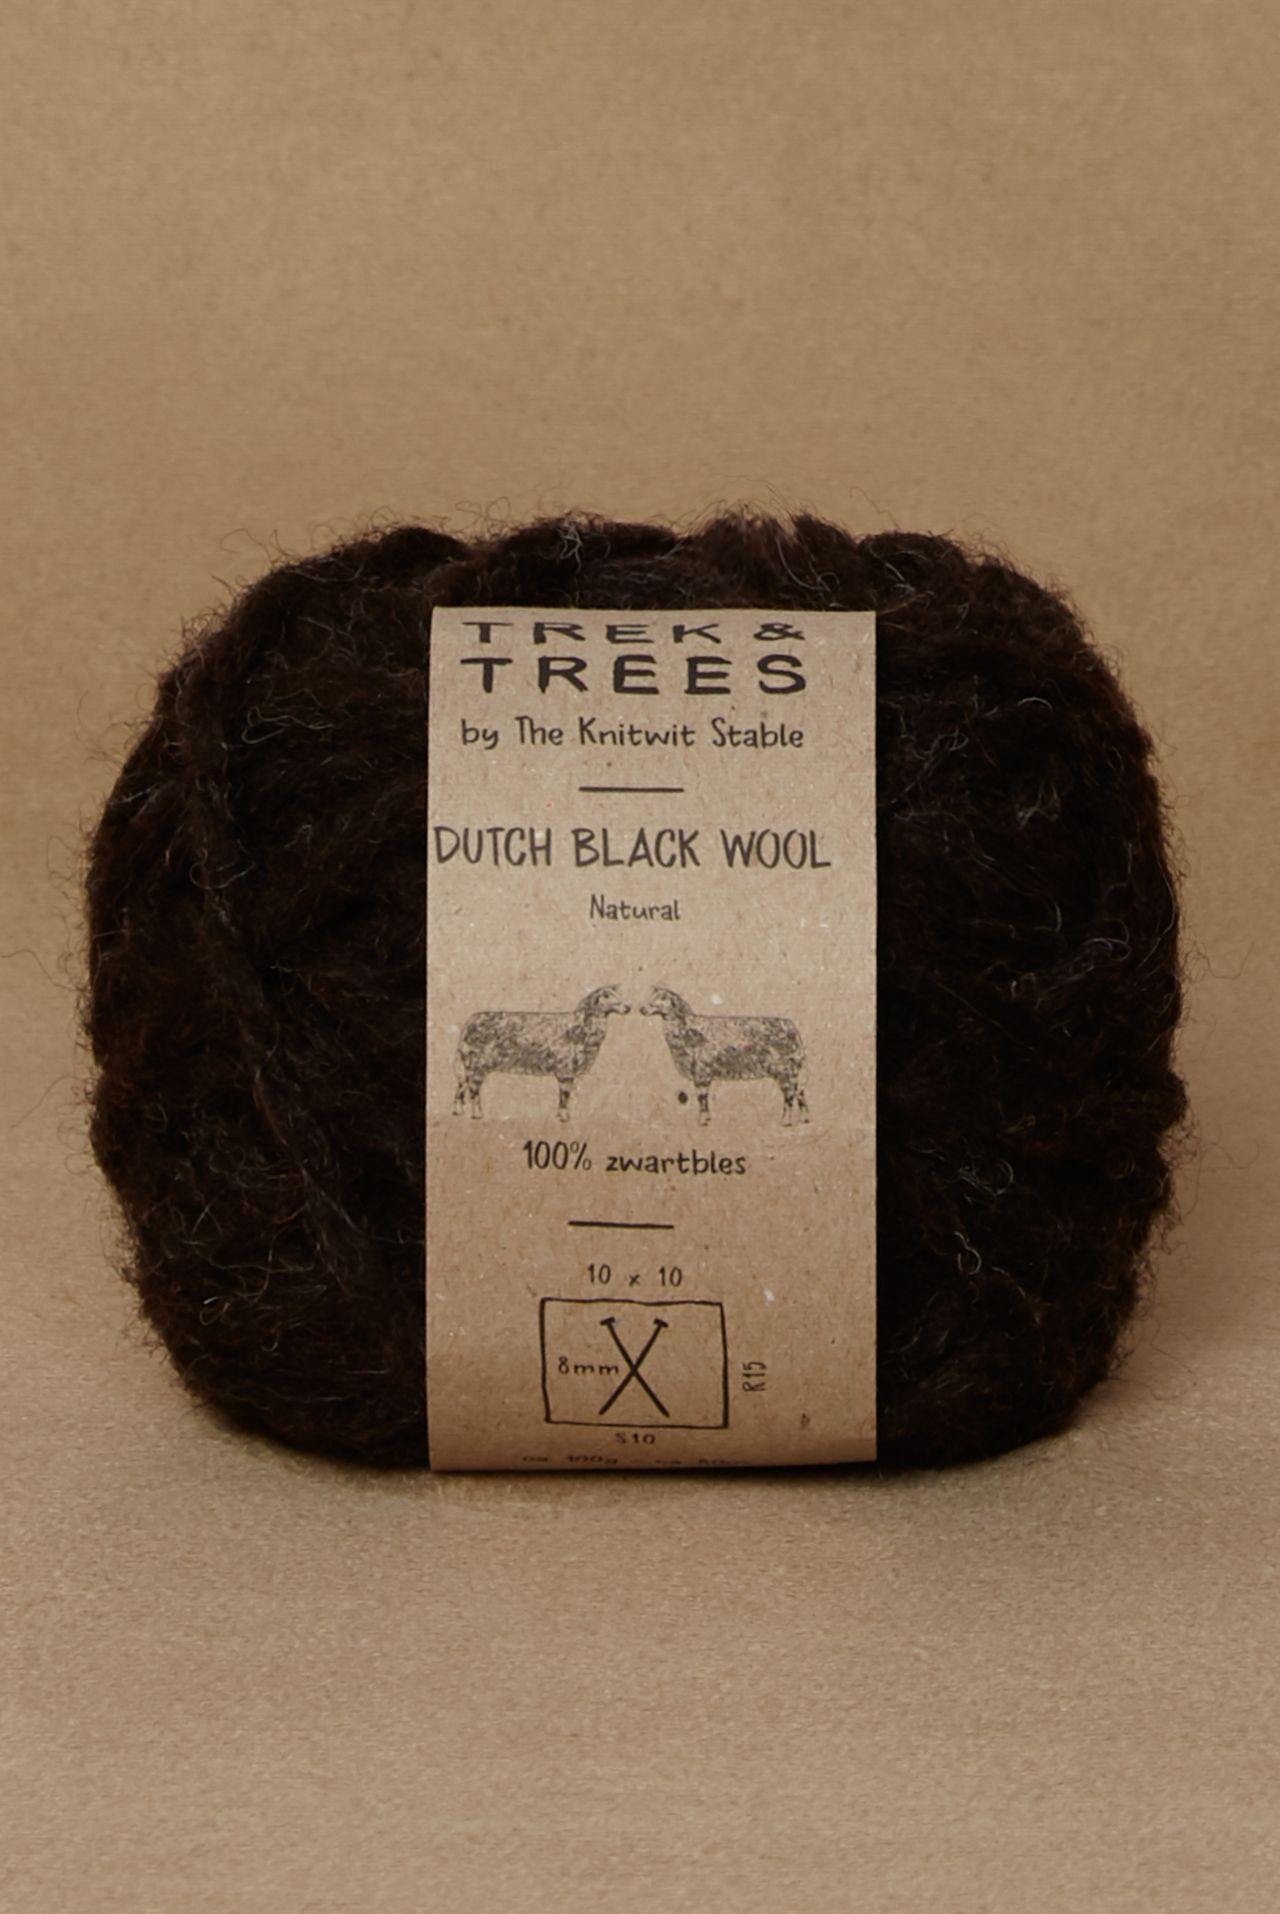 Dutch black wool packshot.